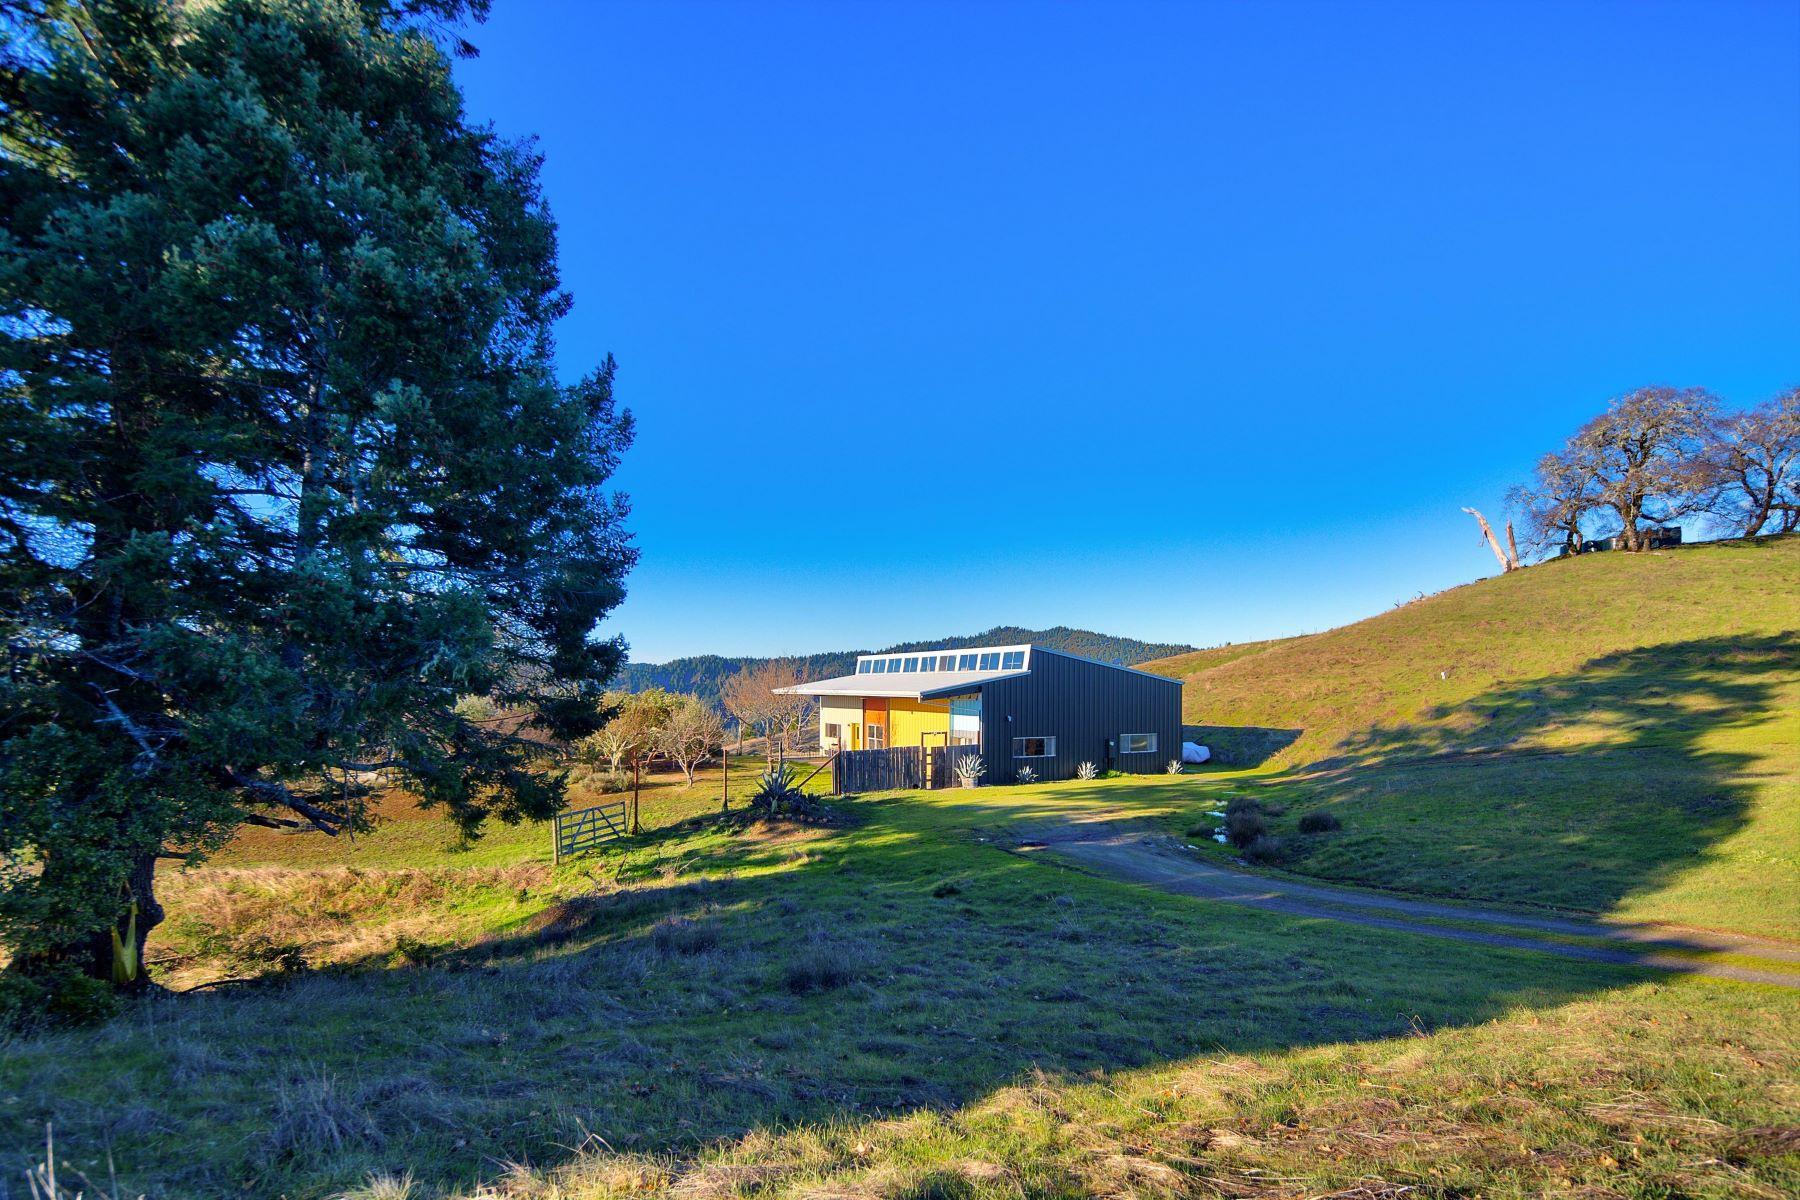 Single Family Homes for Active at A Modern Retreat on 178 Acres Near Ukiah, California 12560 Orr Springs Rd Ukiah, California 95482 United States